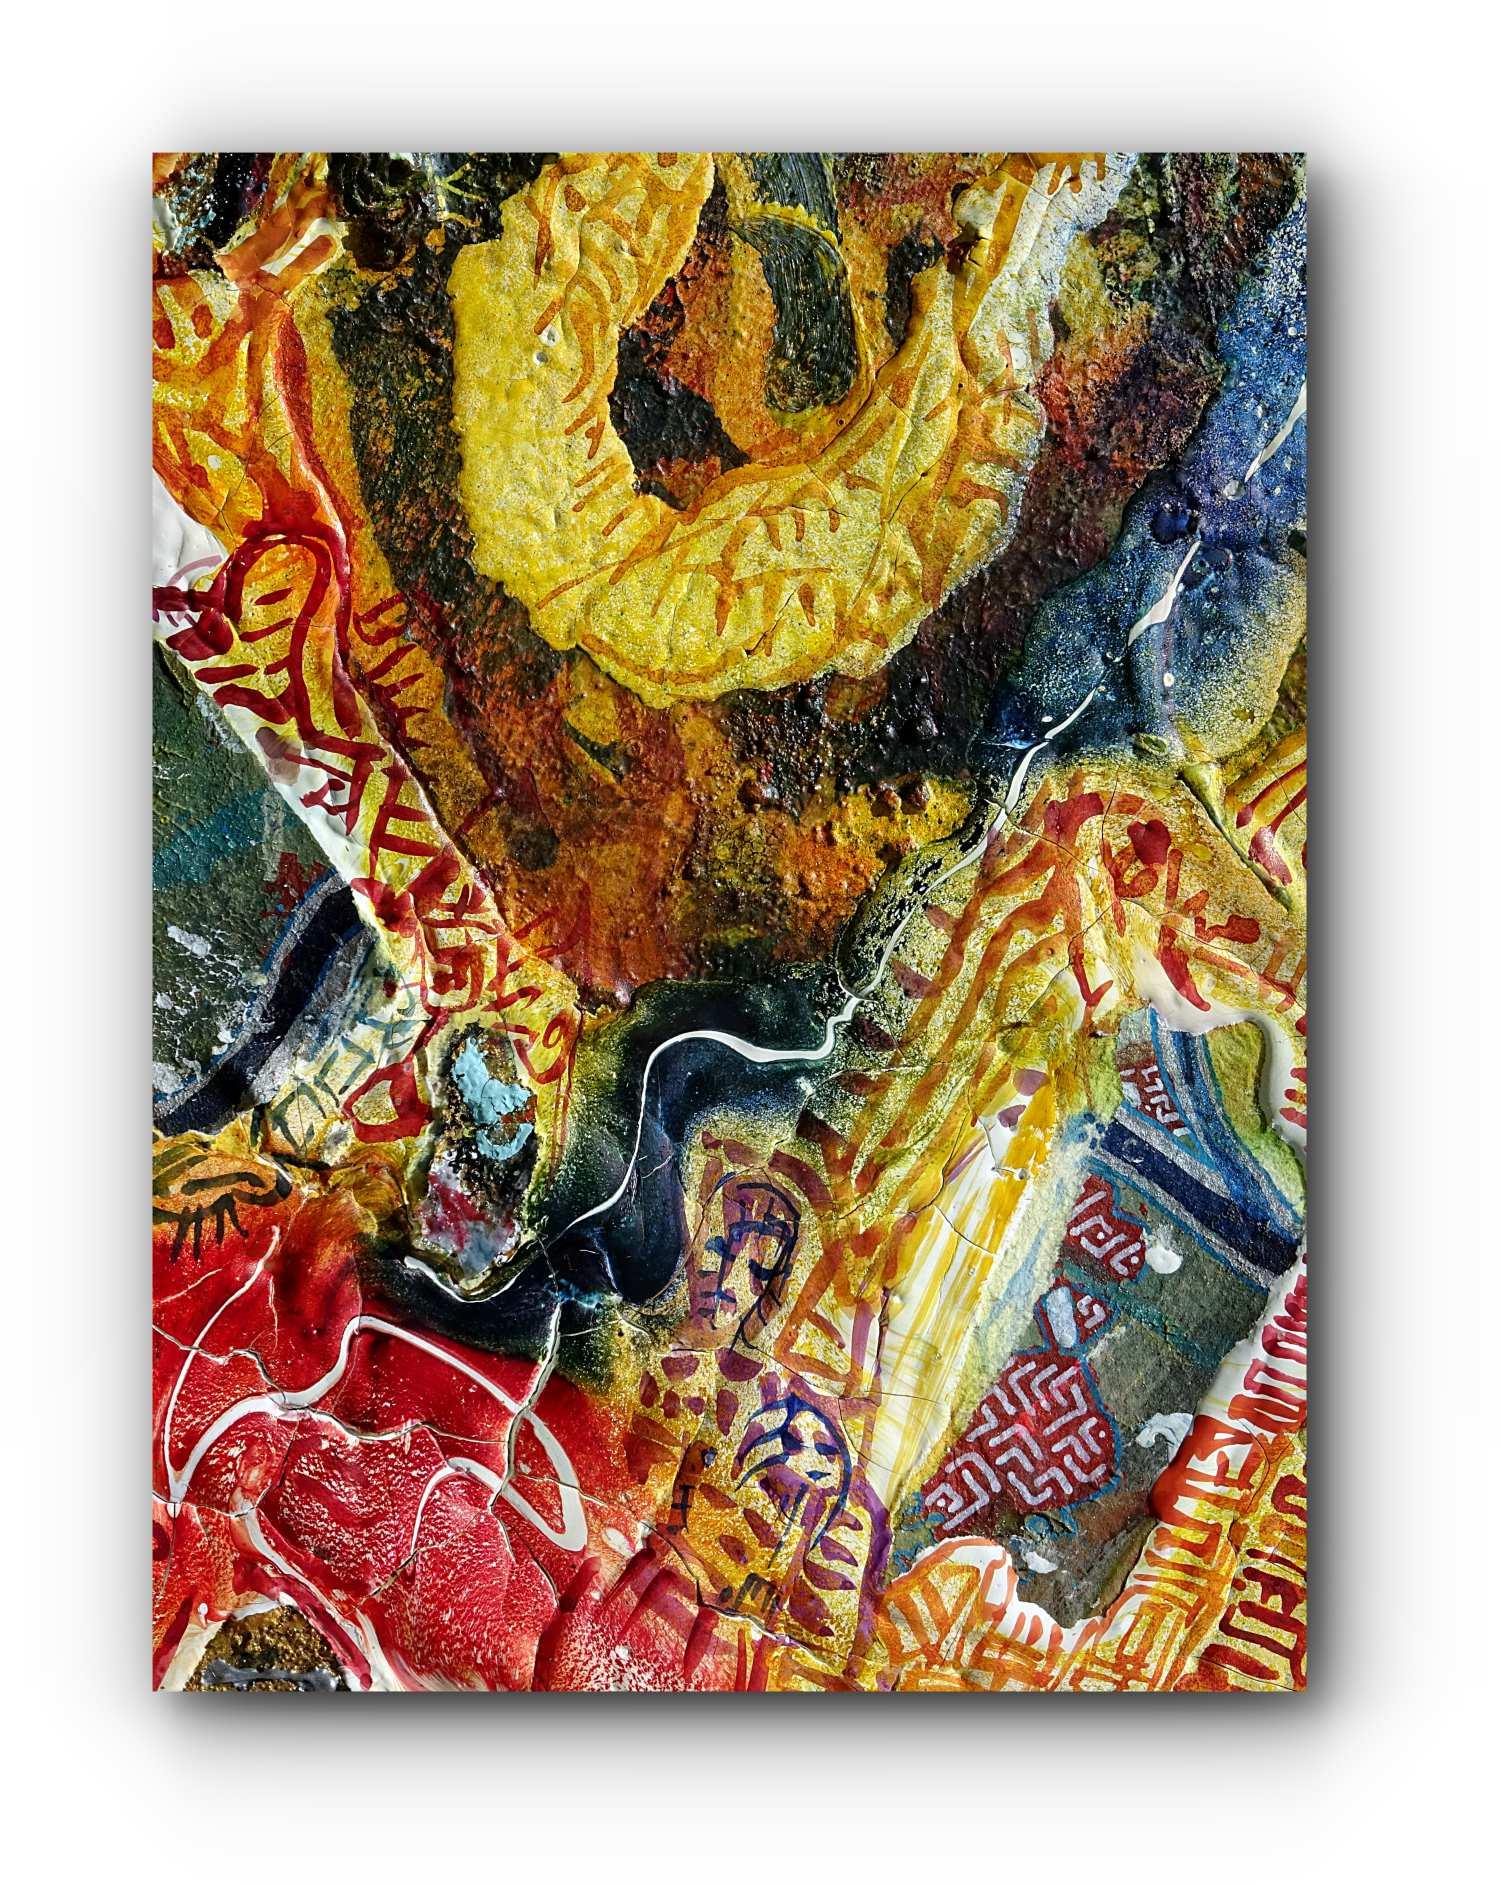 painting-detail-16-kiss-artist-duo-ingress-vortices.jpg